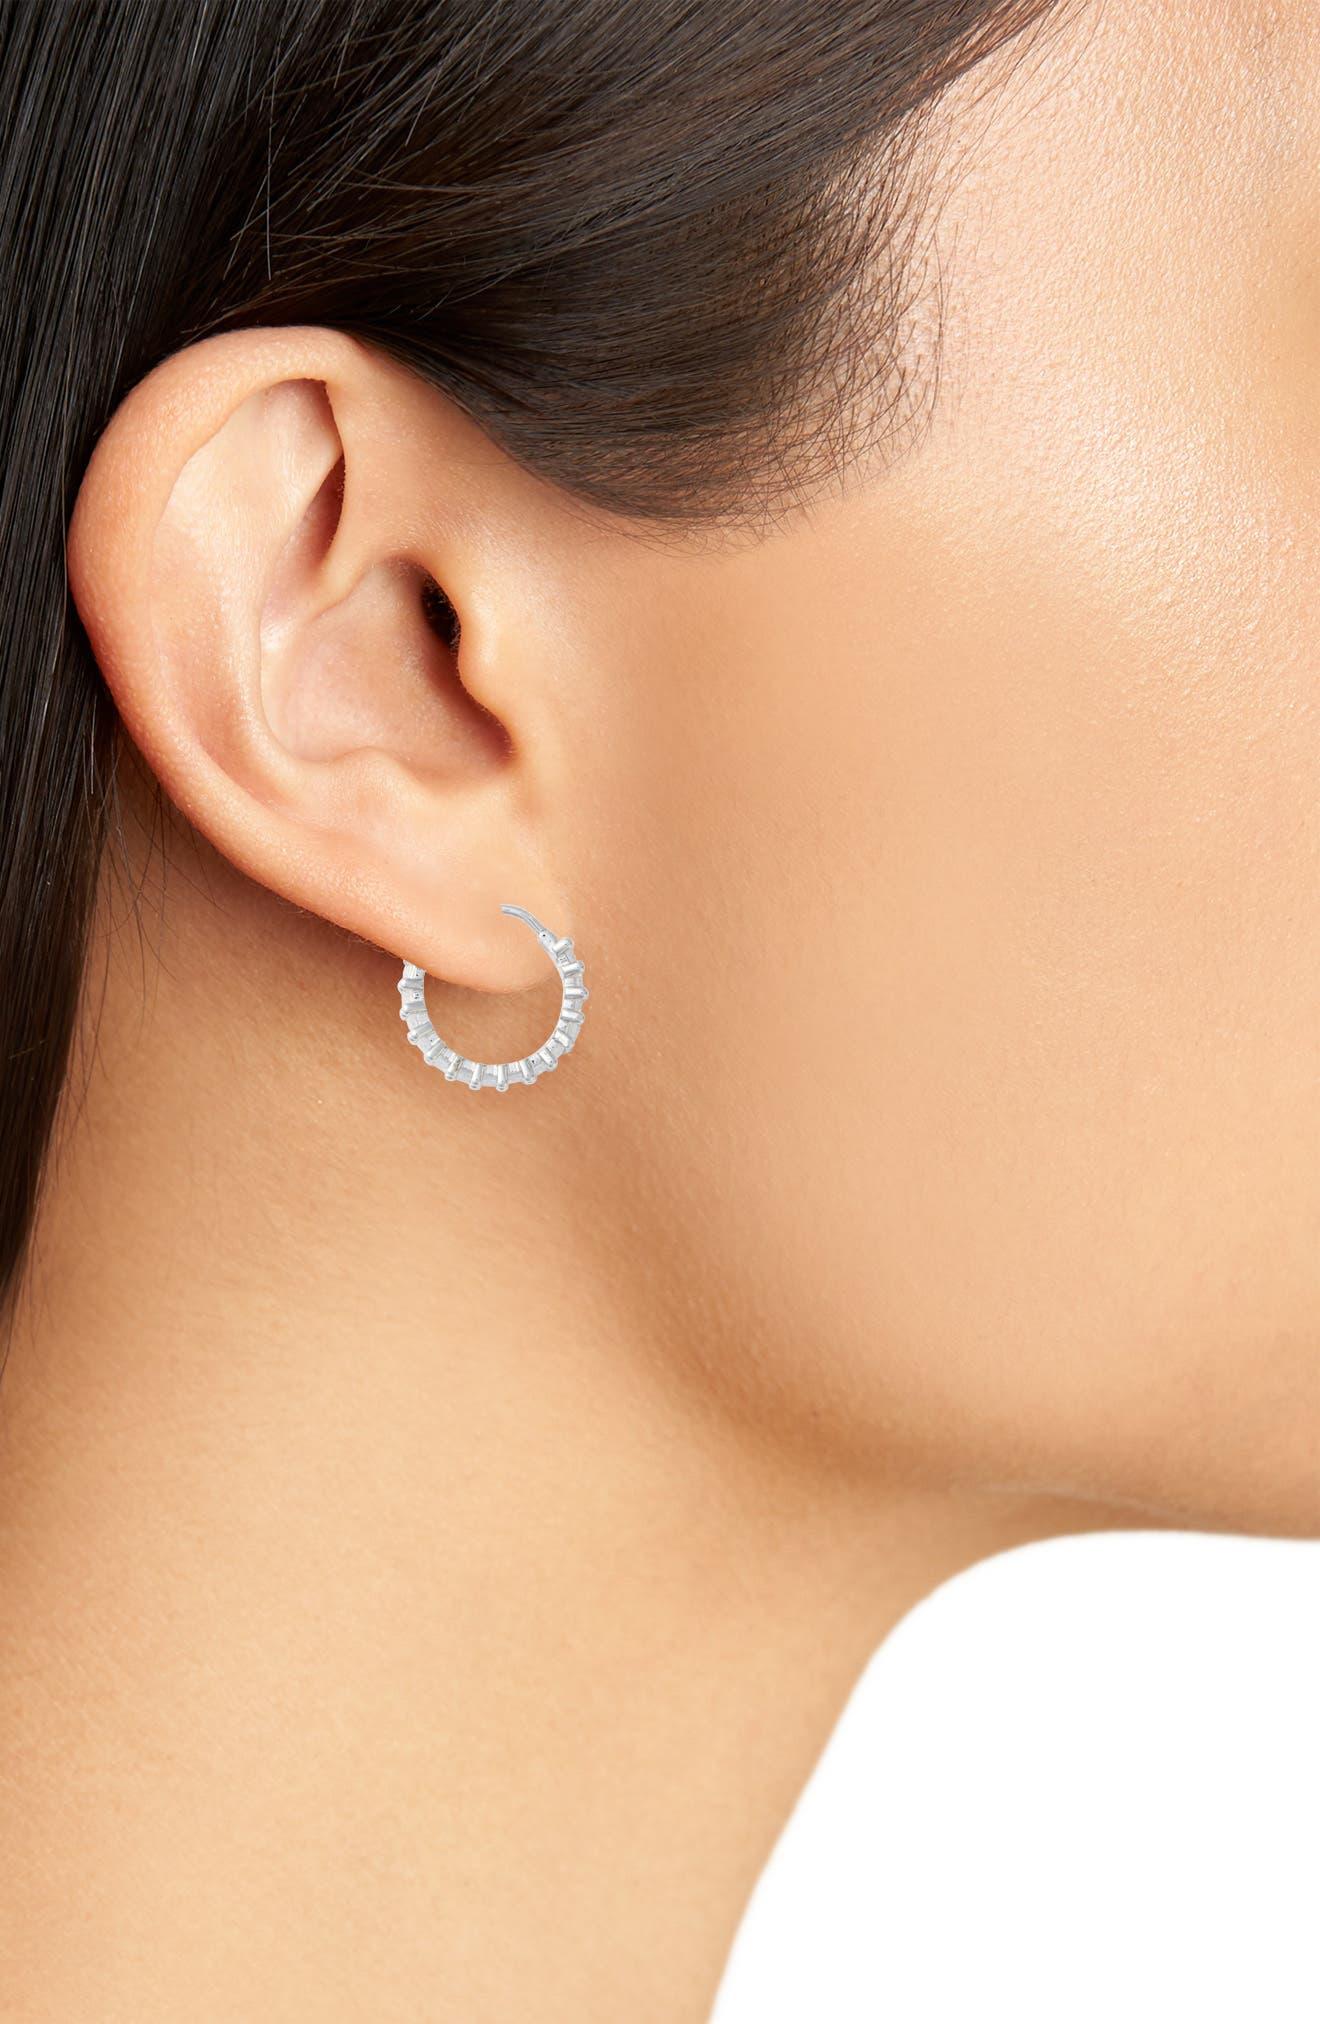 Small Baguette Hoop Earrings,                             Alternate thumbnail 2, color,                             040